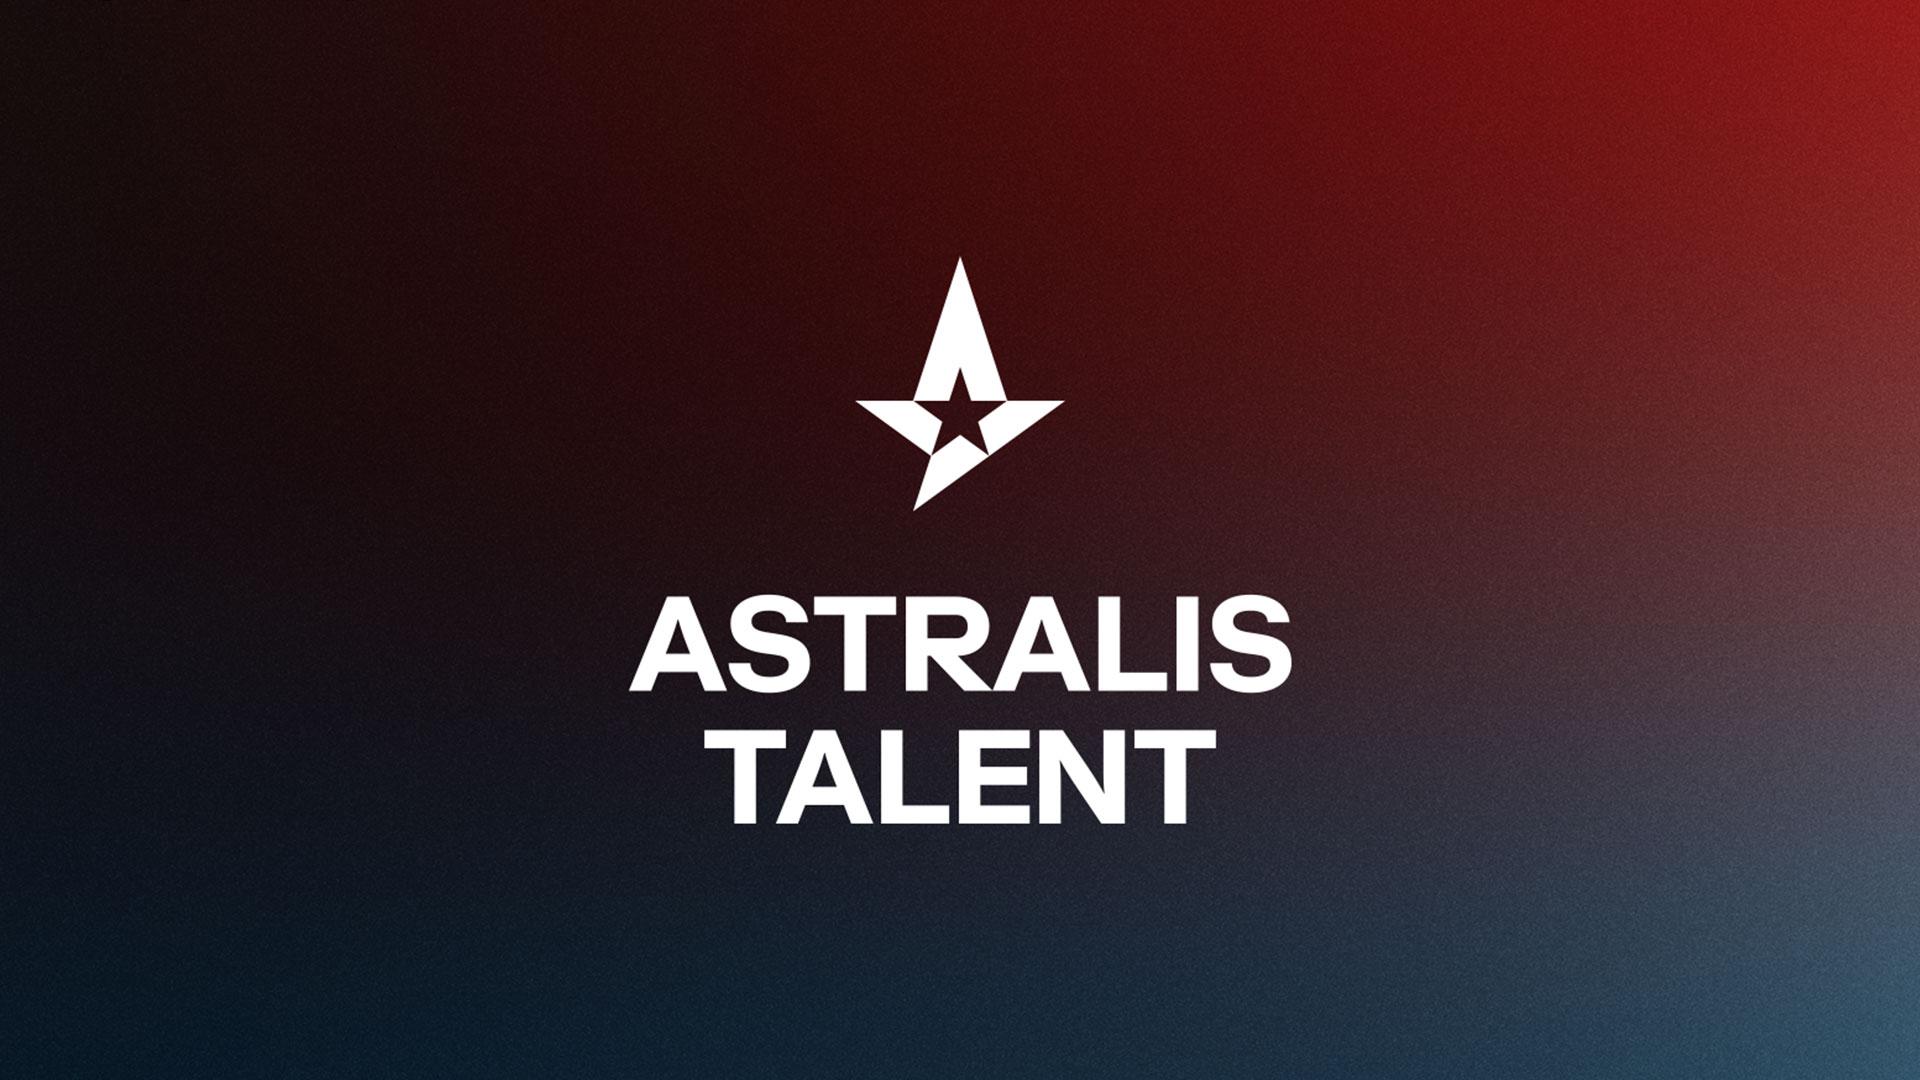 Astralis Talent fördert junge talentierte Gamer